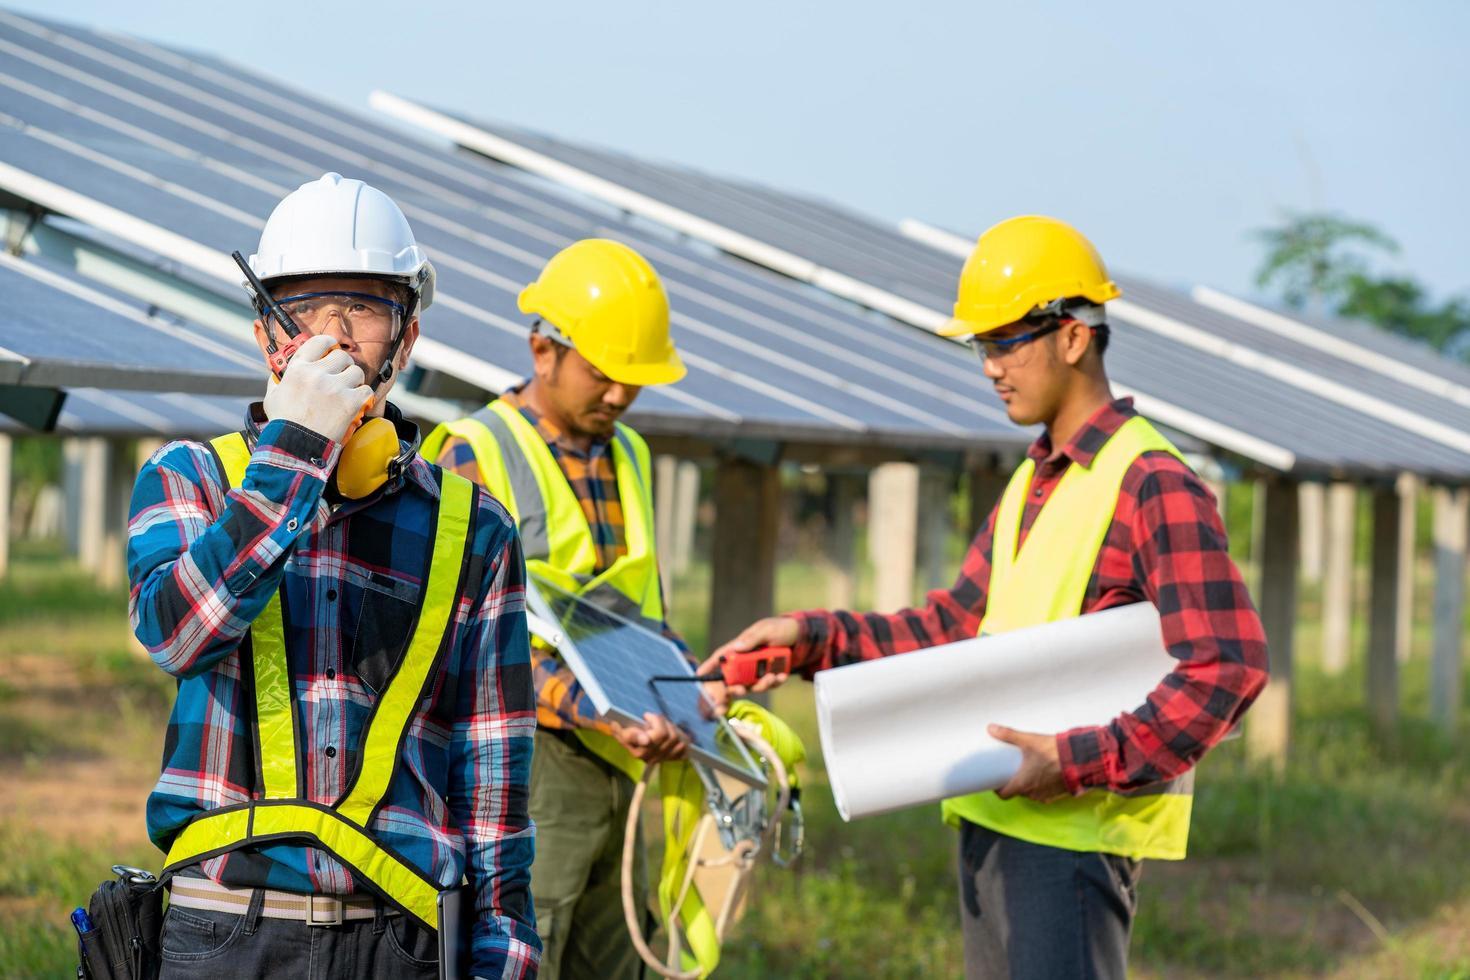 Men wearing safety equipment next to solar panels photo